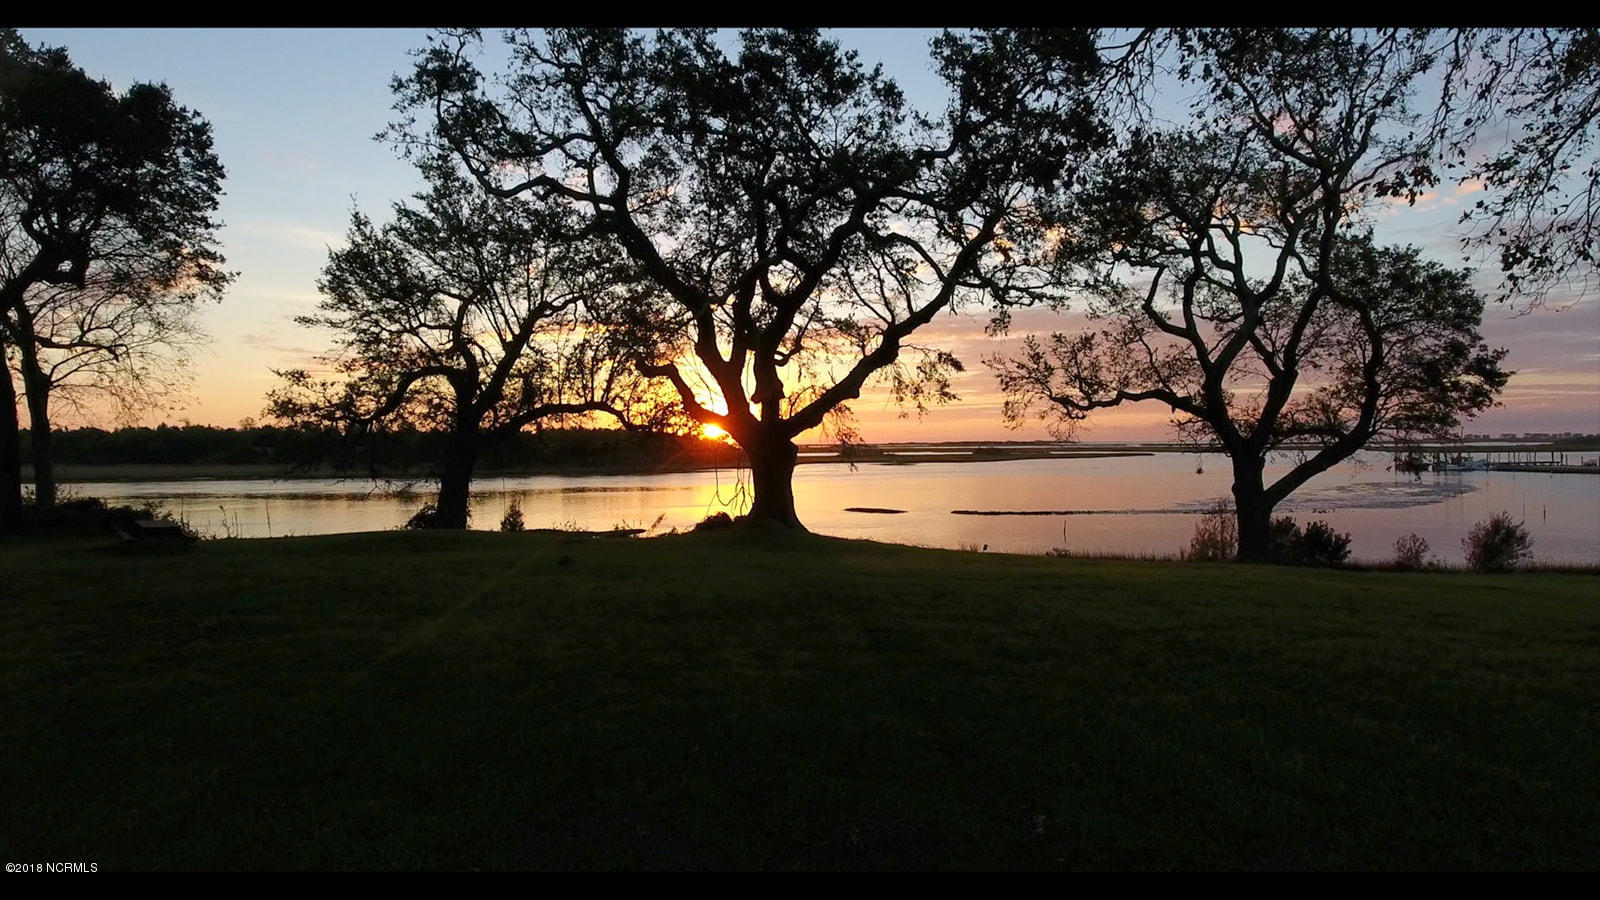 Tbd Flamingo Ln/Peru Dr, Sneads Ferry, North Carolina, ,Residential land,For sale,Flamingo Ln/Peru Dr,100139076